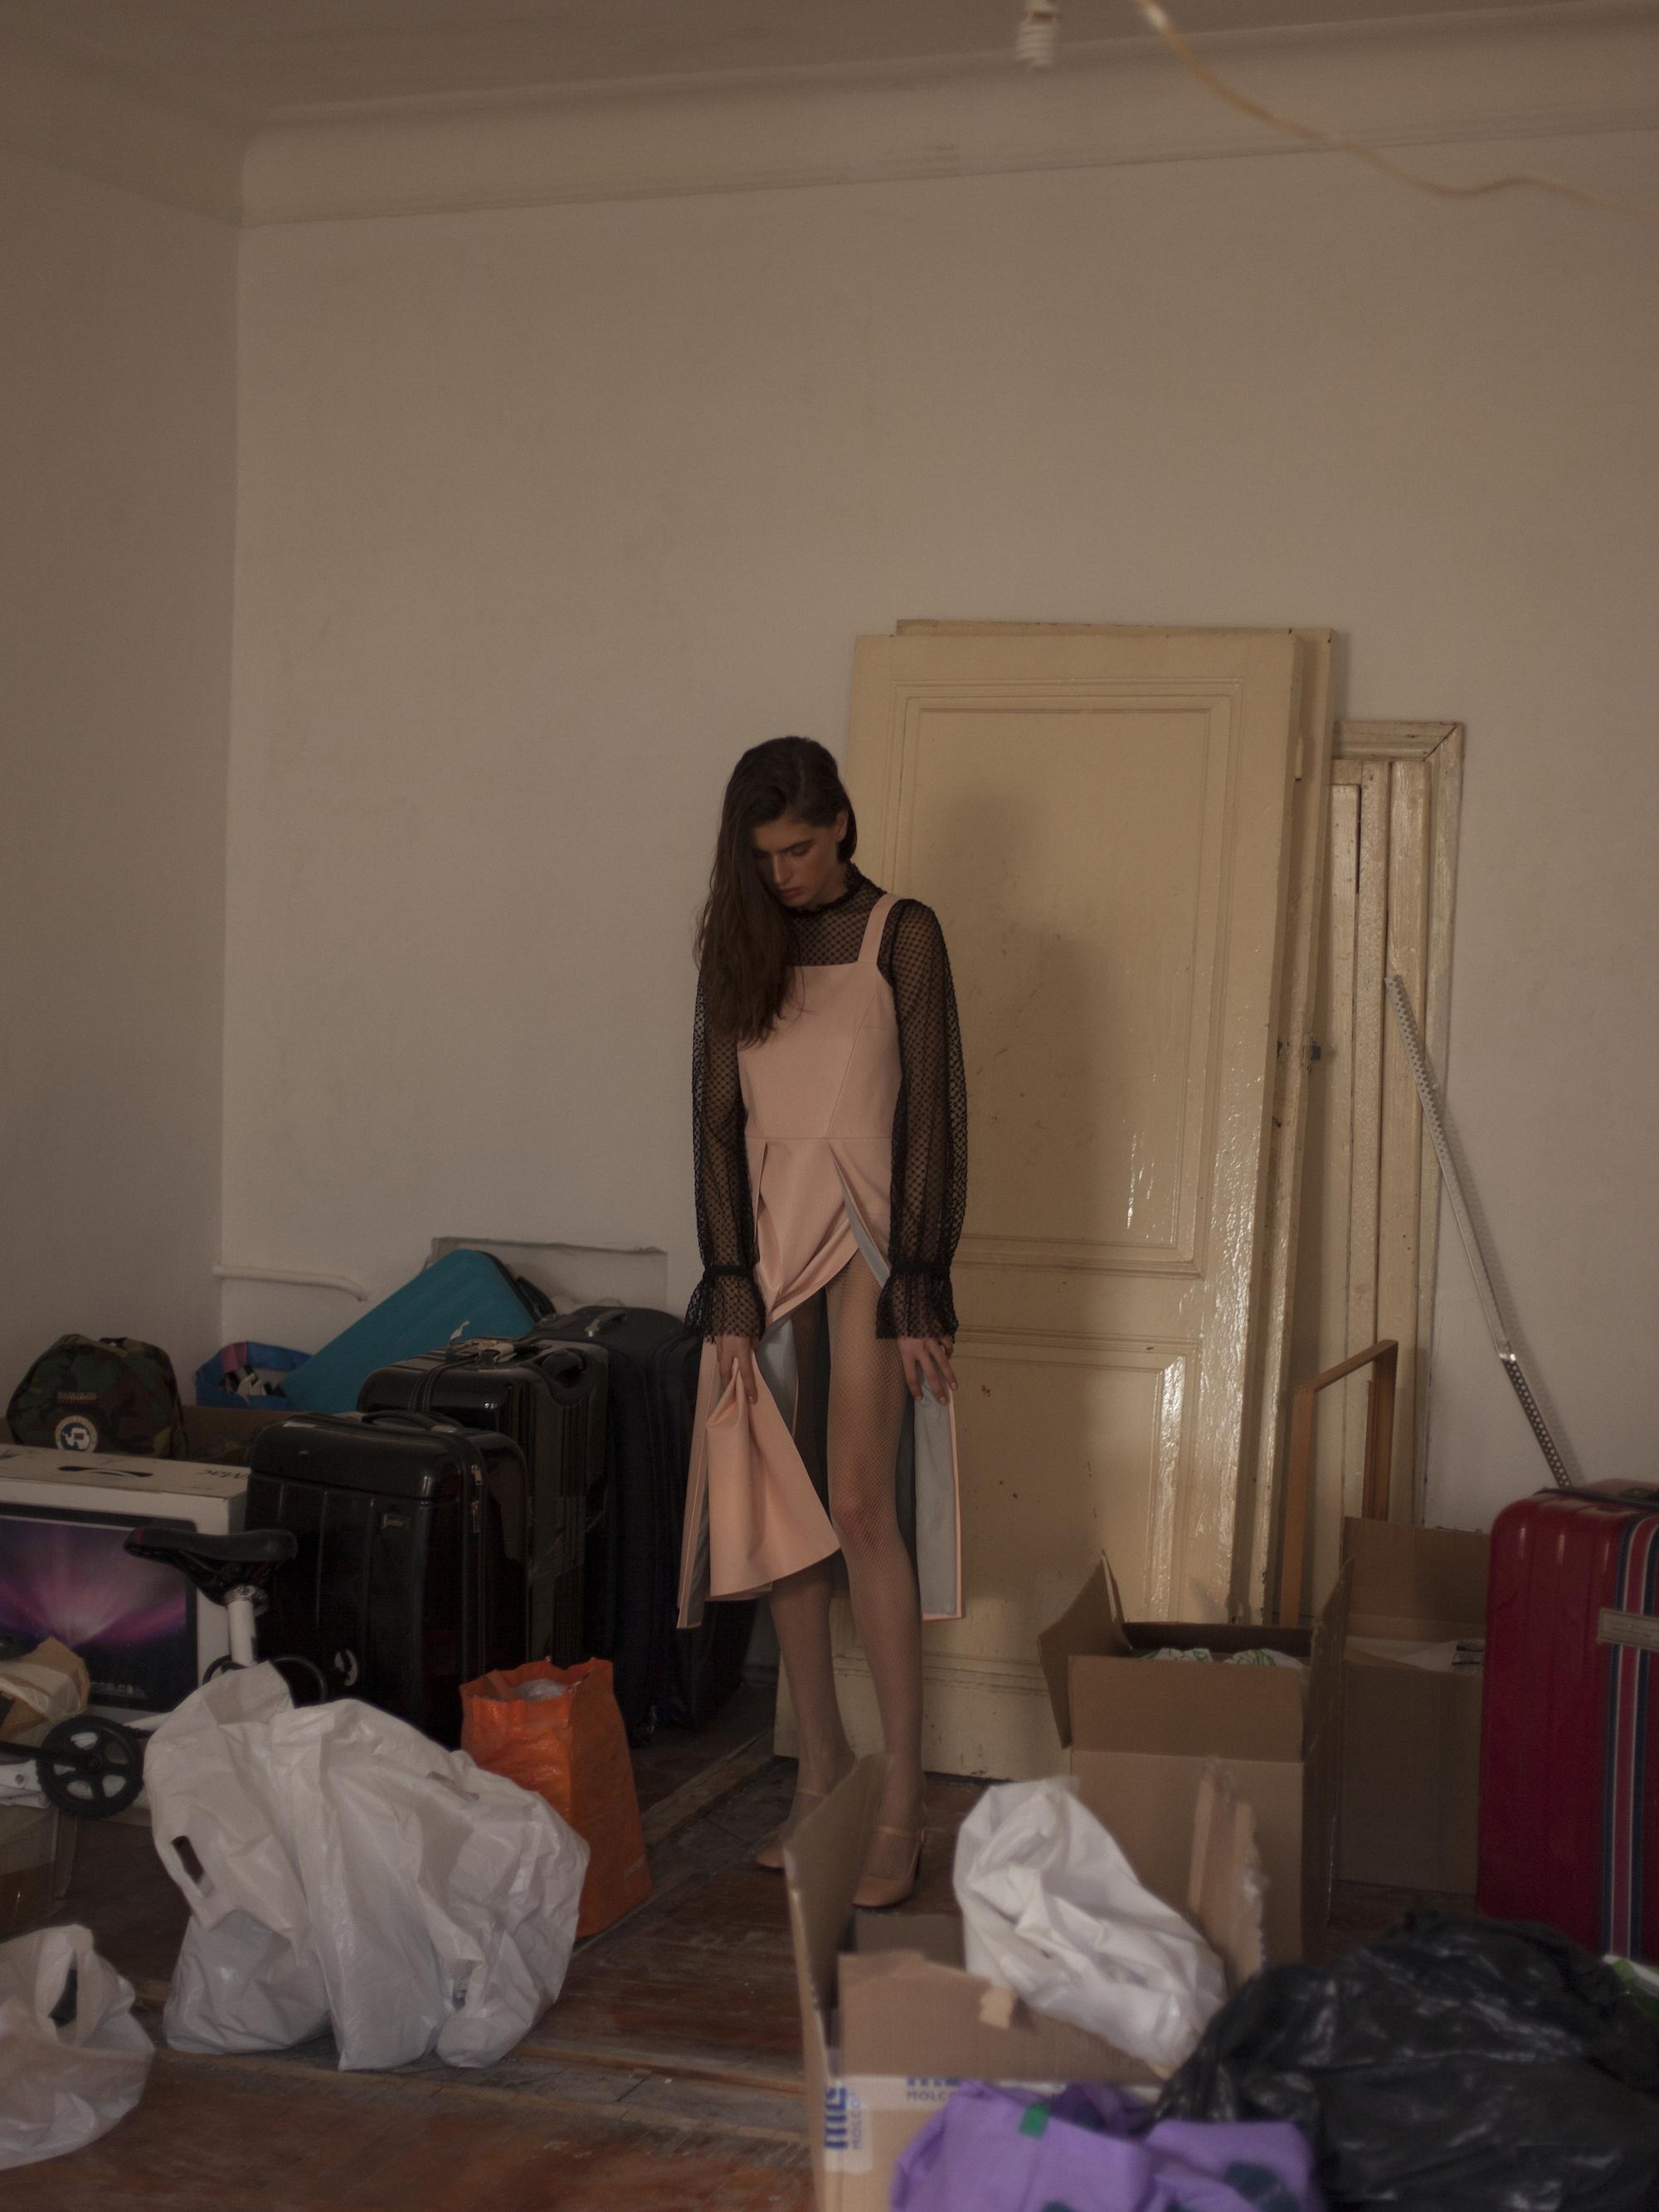 Dress FORMA, Top YASYA MINOCHKINA